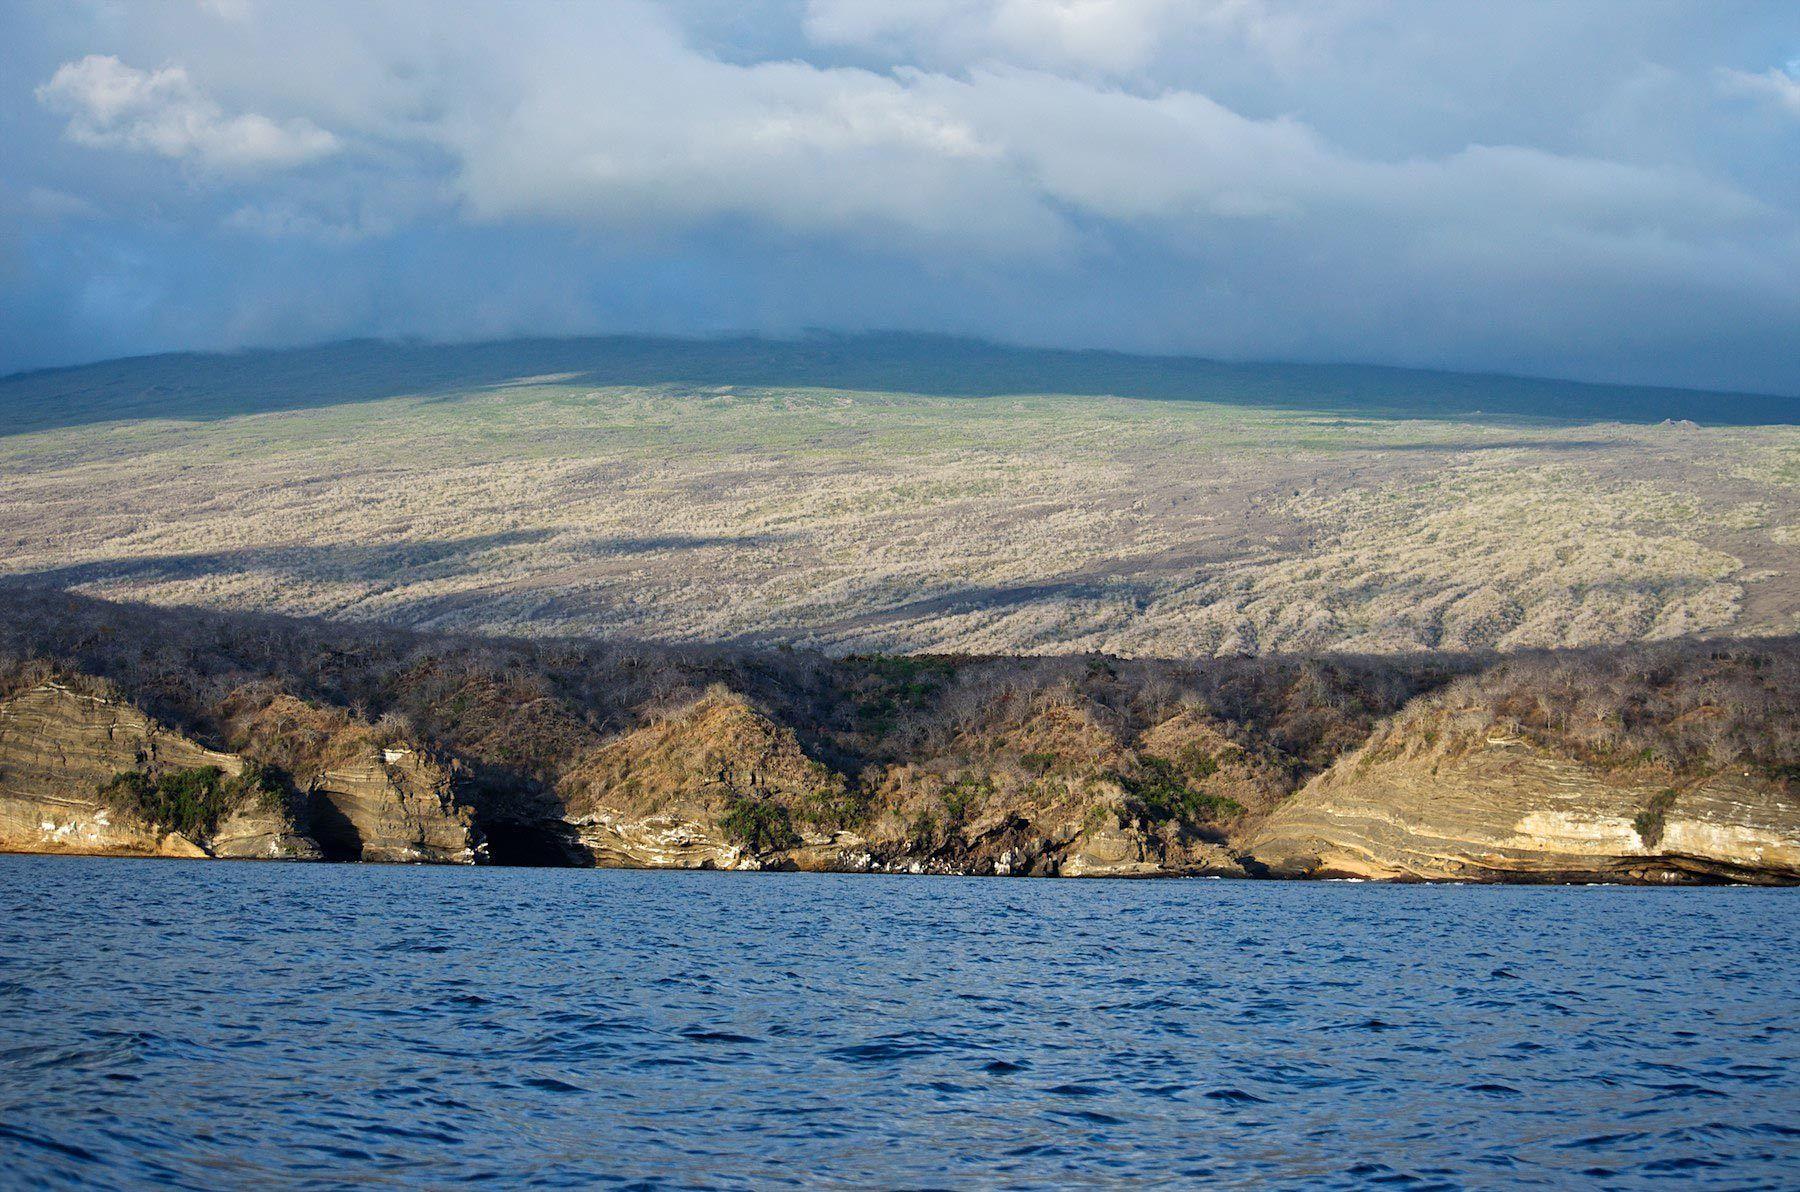 Galapagos mountains